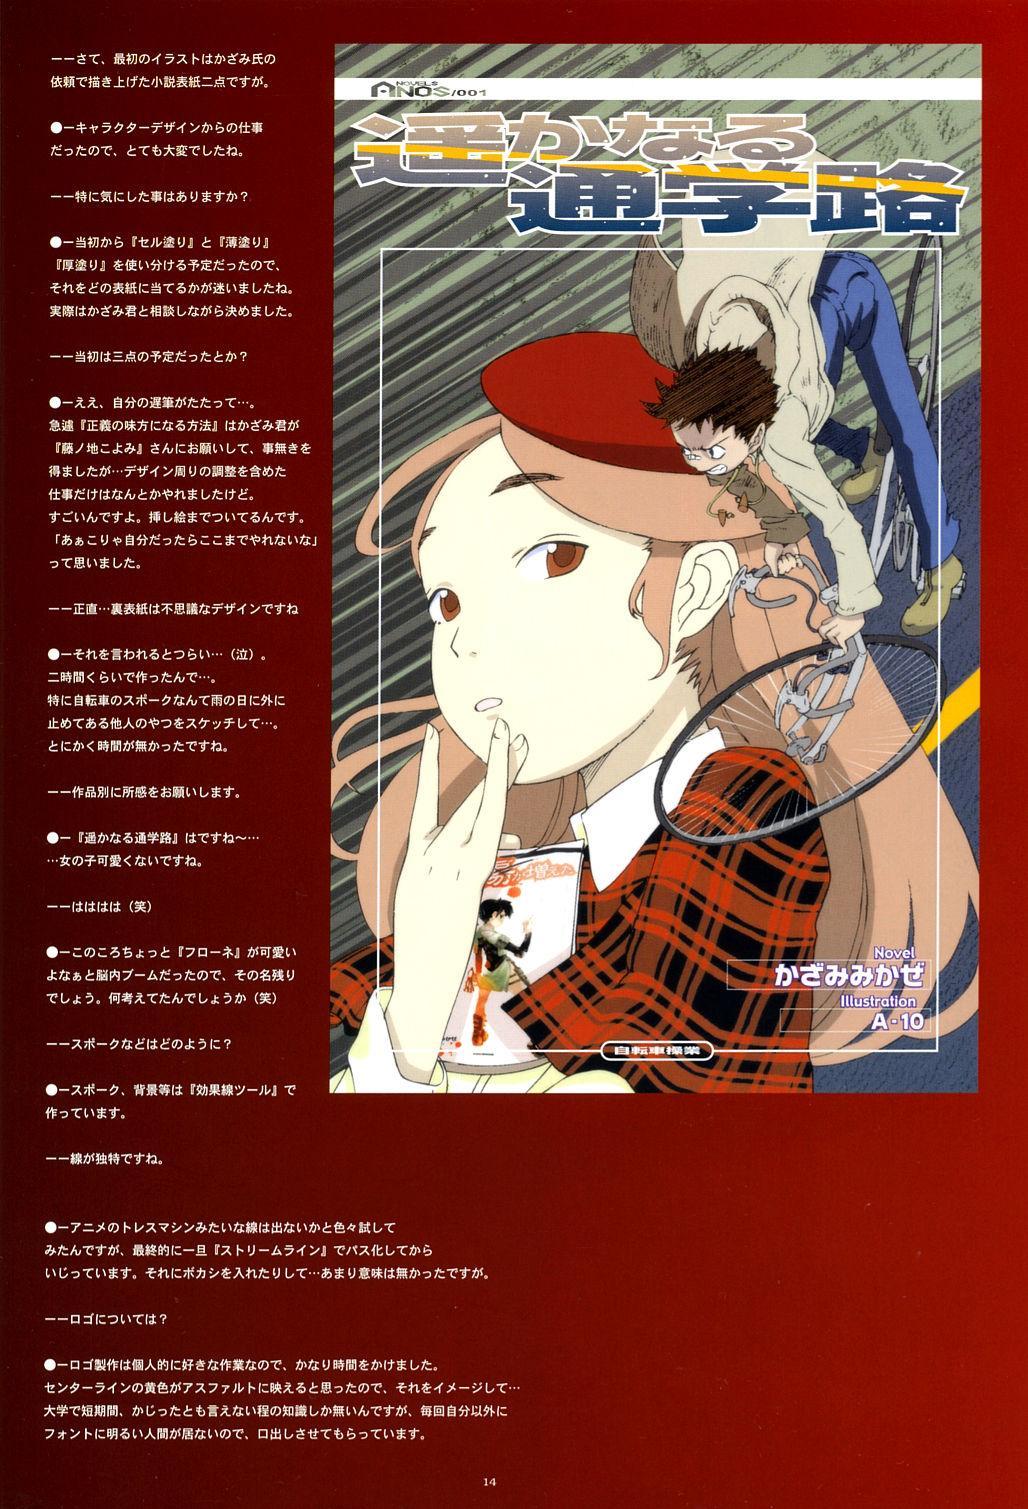 Kikan GIRLIE Vol.2 12